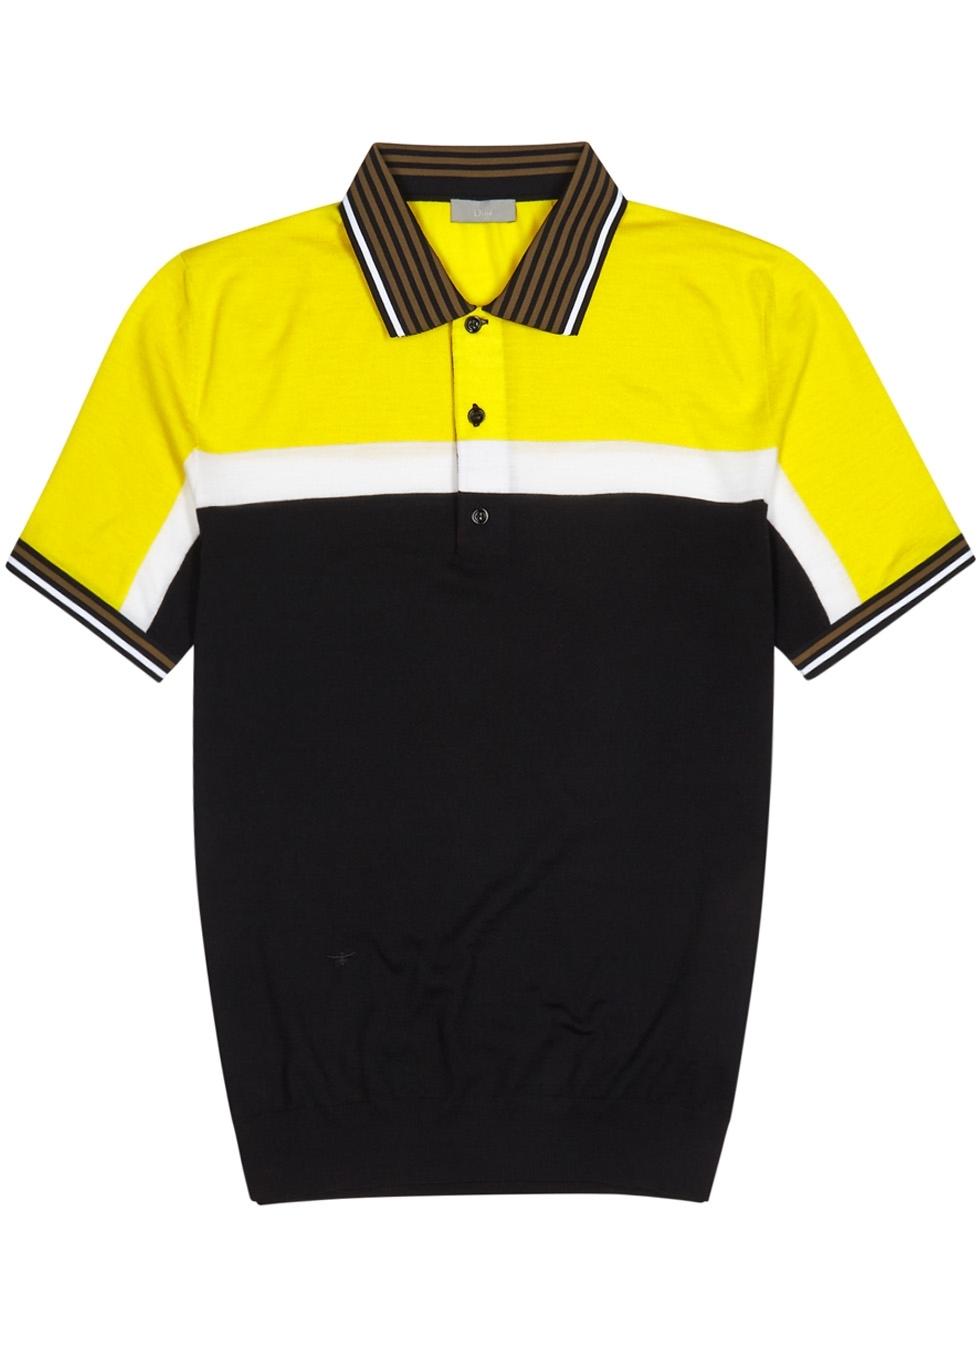 Dior Homme T Shirts Polo Jackets Scarves Harvey Nichols Kaos Polos Yellow Baby